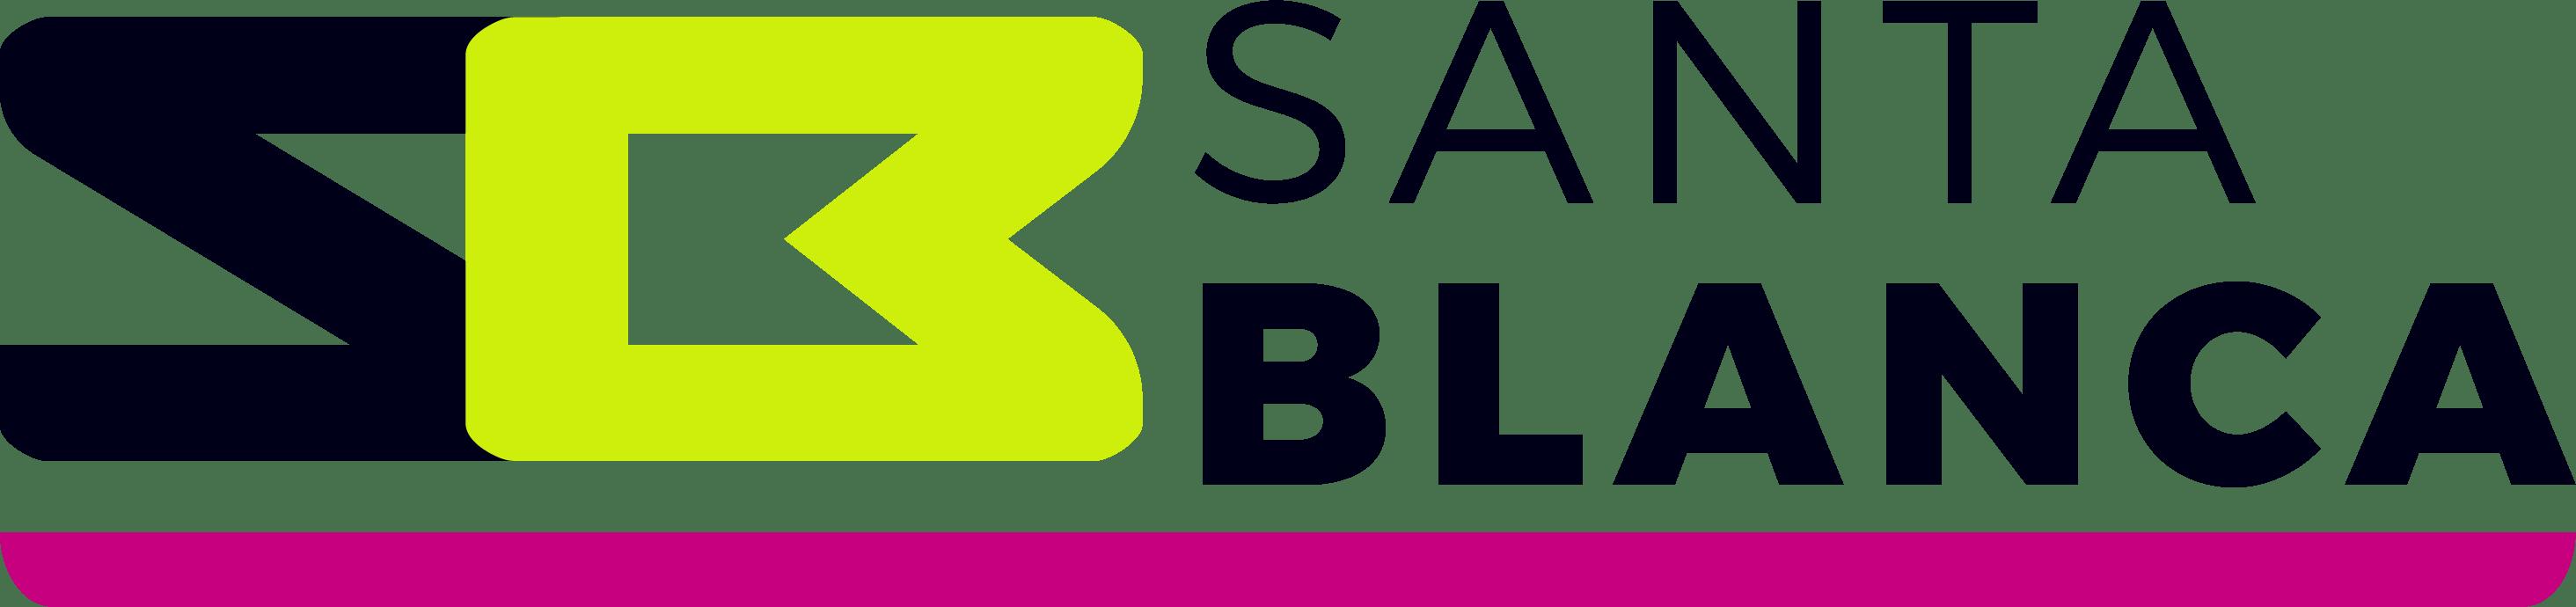 Santa Blanca Spa